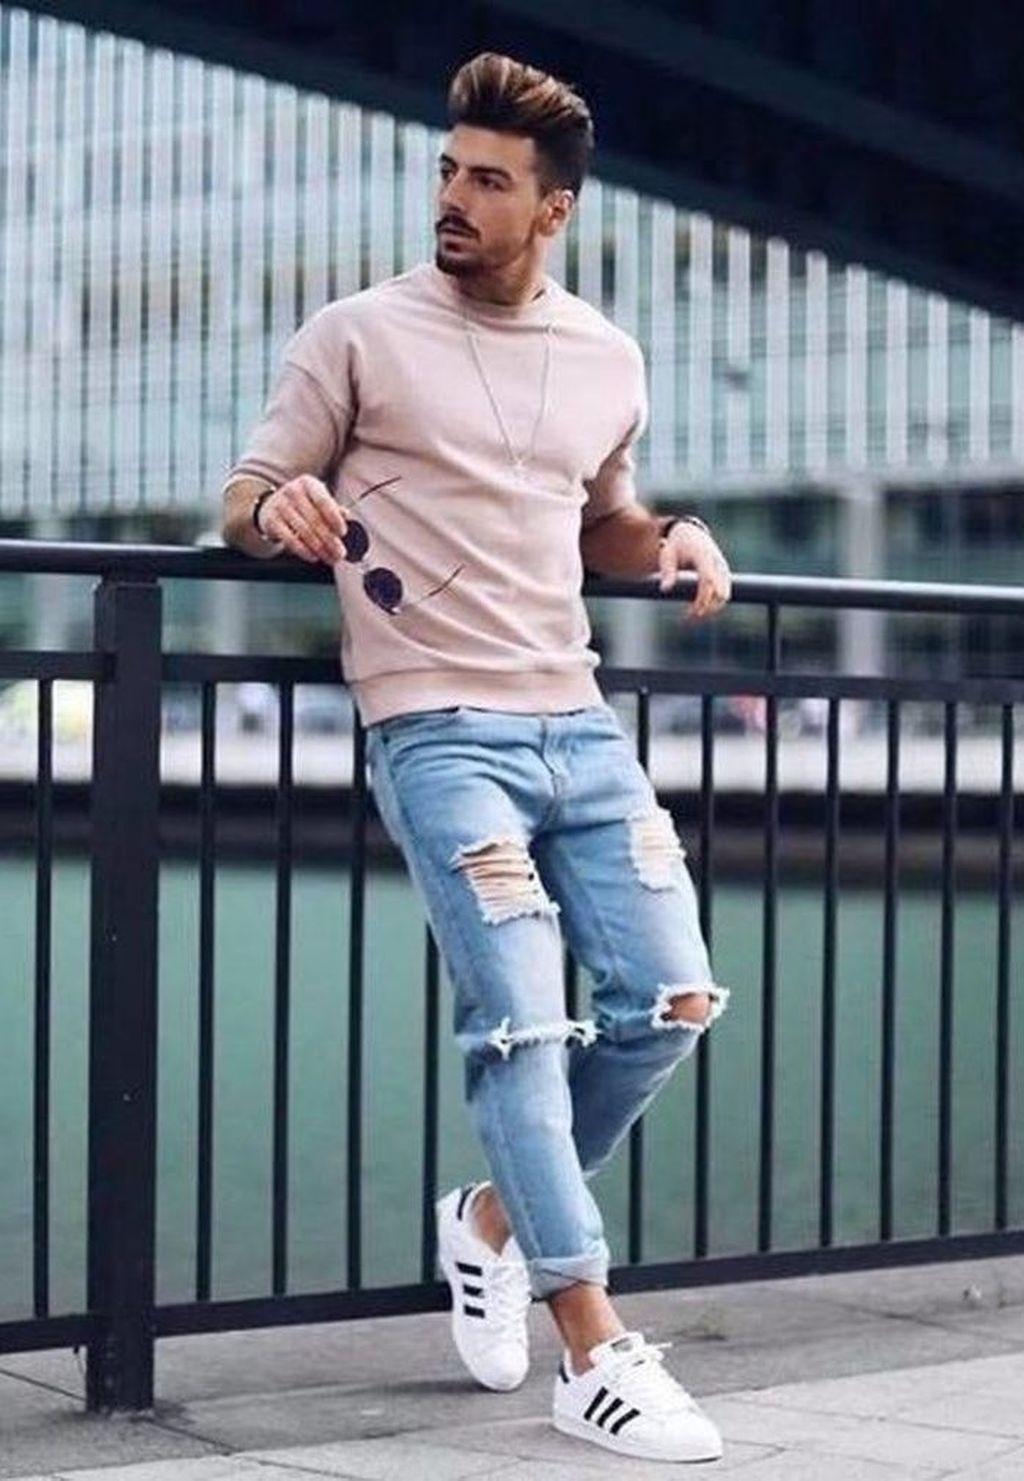 Pin de Noe Suarez en Outfits | Ropa de hombre, Estilo de